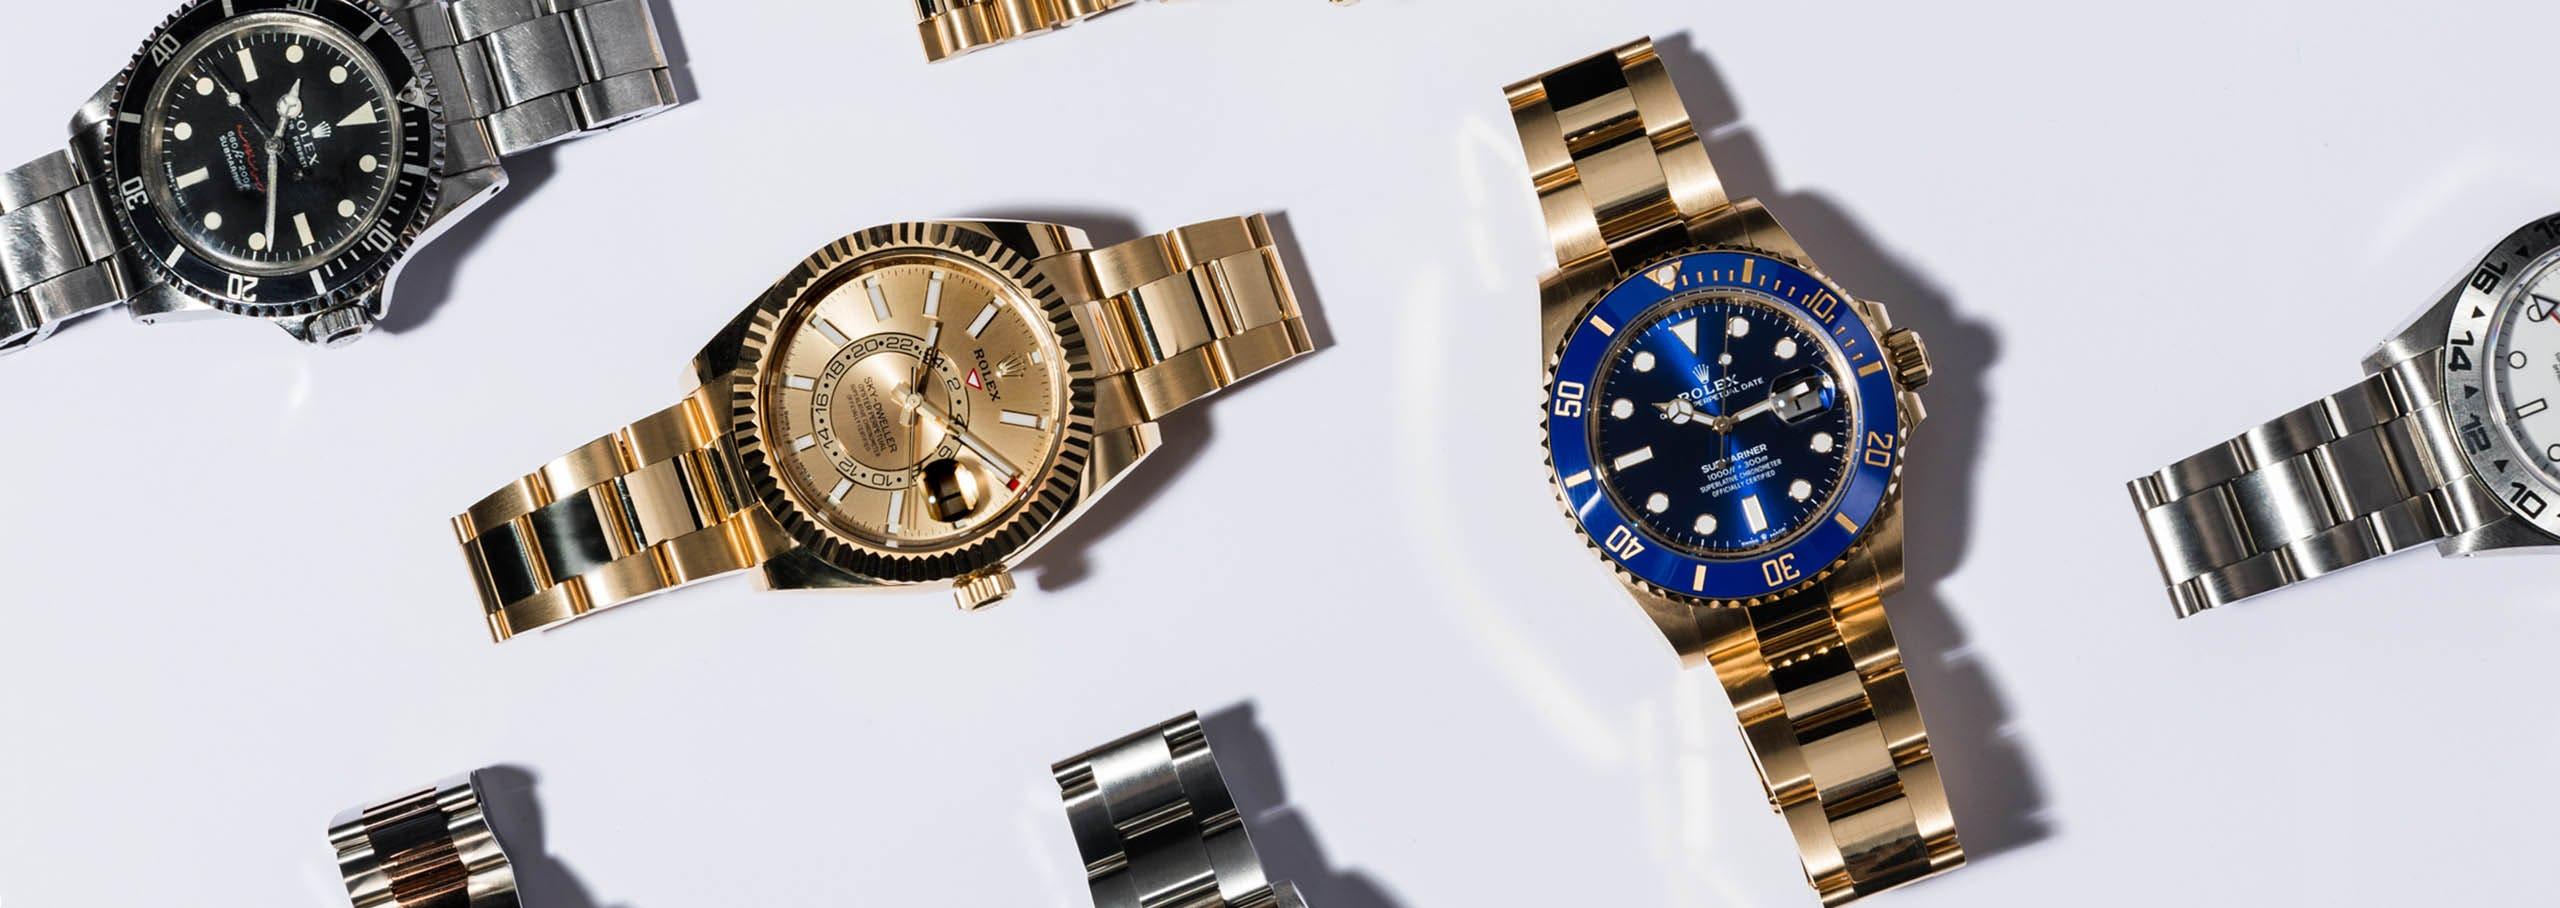 A Peek Ahead: The Trajectory of the Rolex Watch Market